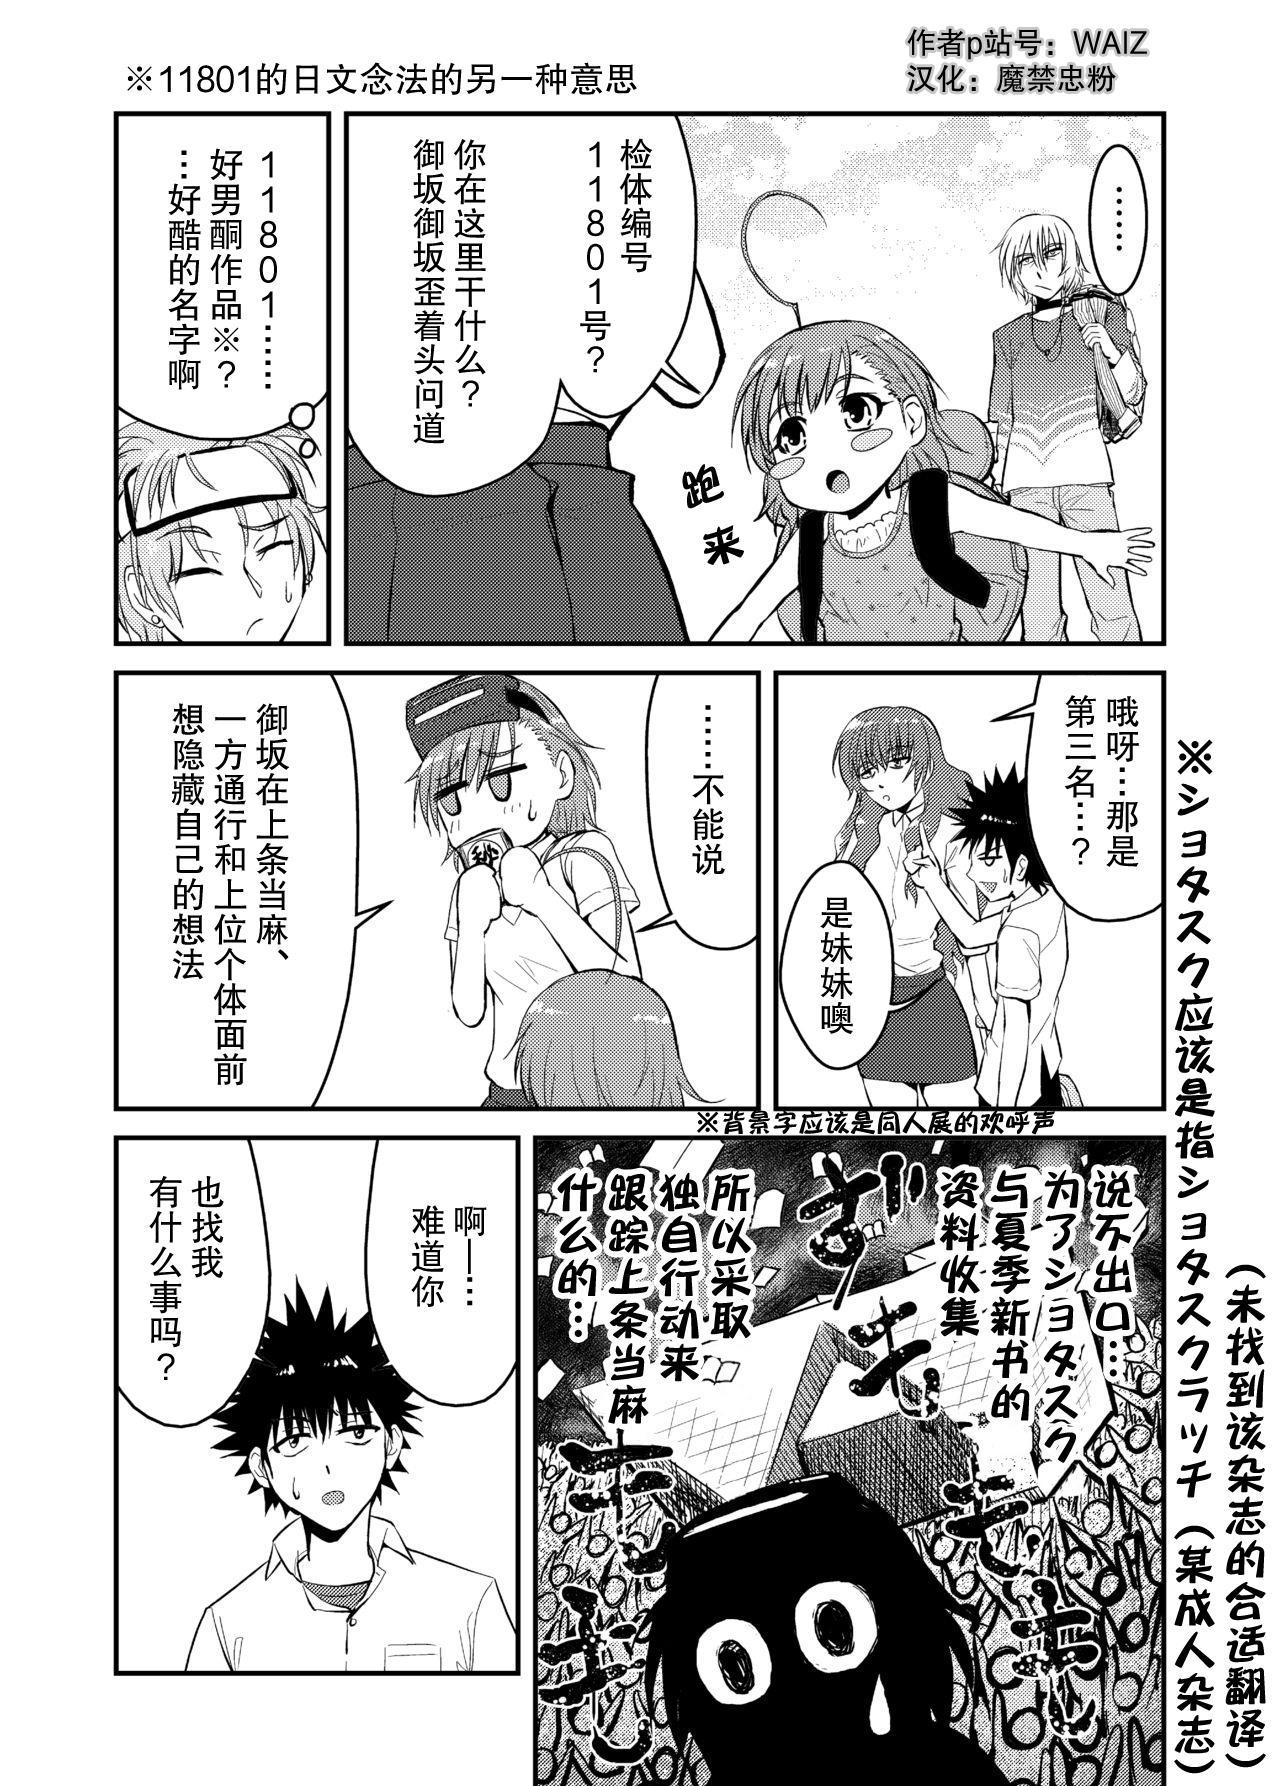 [WAIZ][同人个人渣汉化][就算是上条先生我家要住7个人还是太勉强了](Toaru Majutsu no Index) [中国翻译] 25